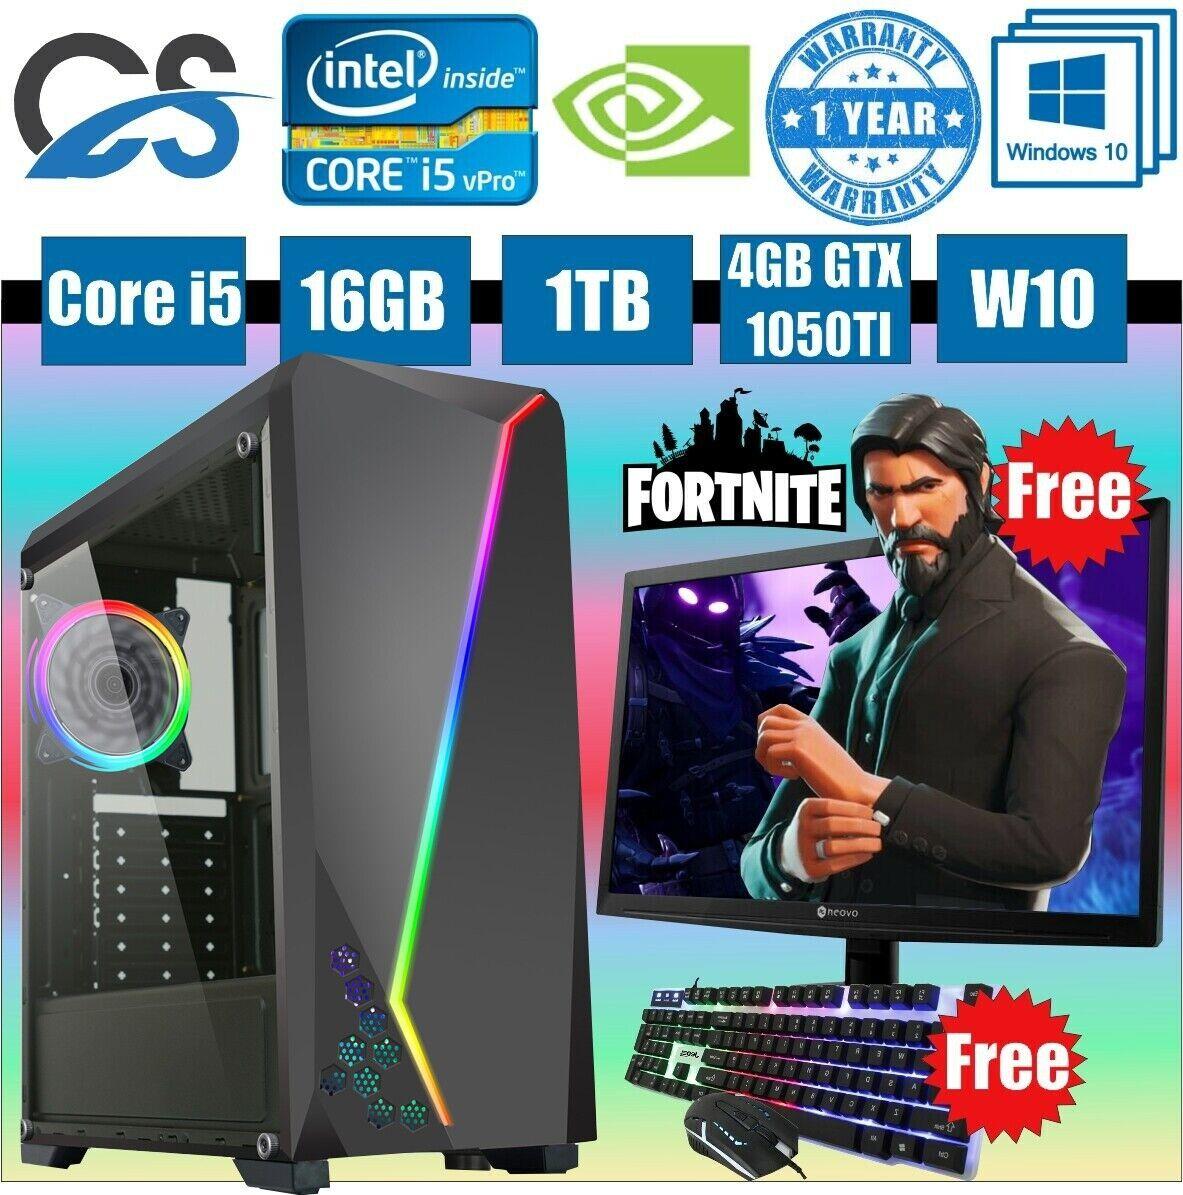 Computer Games - CiT C1007 Gaming Computer PC Bundle Intel Core i5 16GB 1TB GTX 1050TI 19'' LED